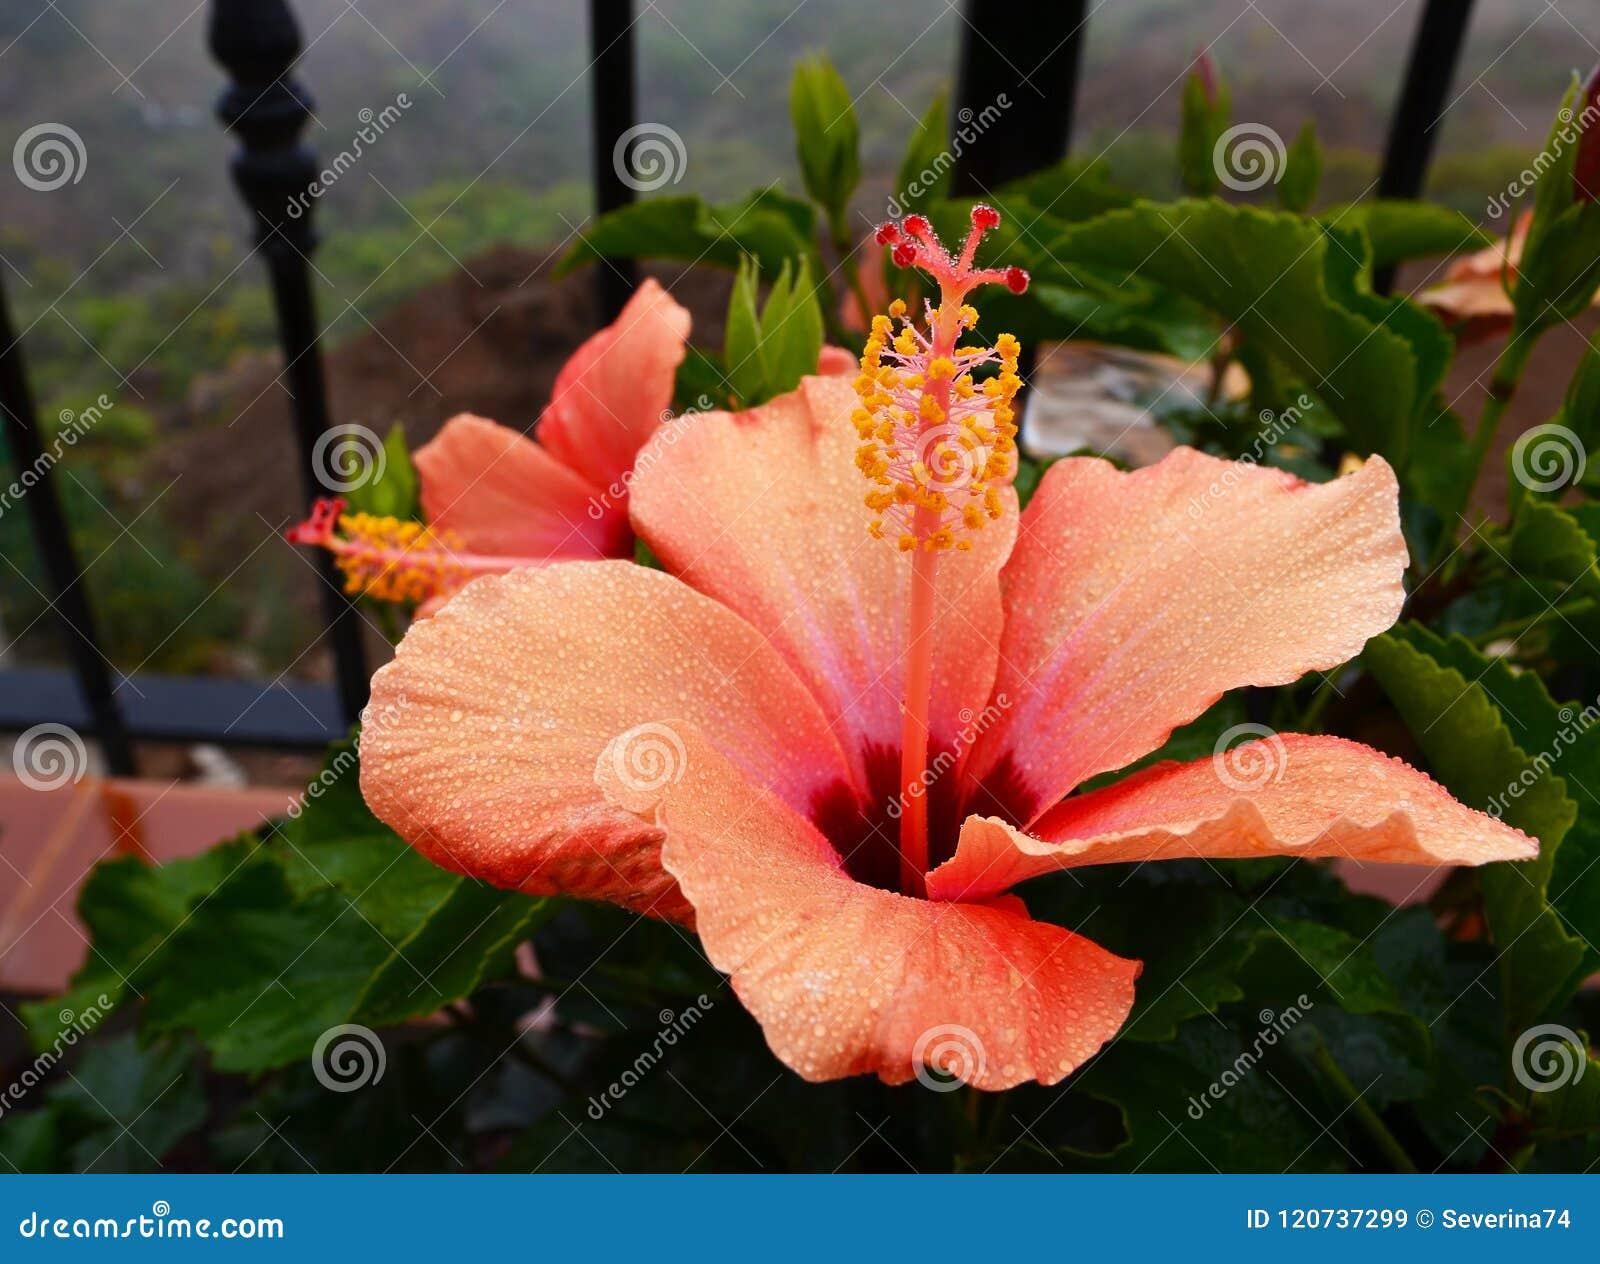 Beautiful Orange Hibiscus Flowers China Rosegudhalchabashoe